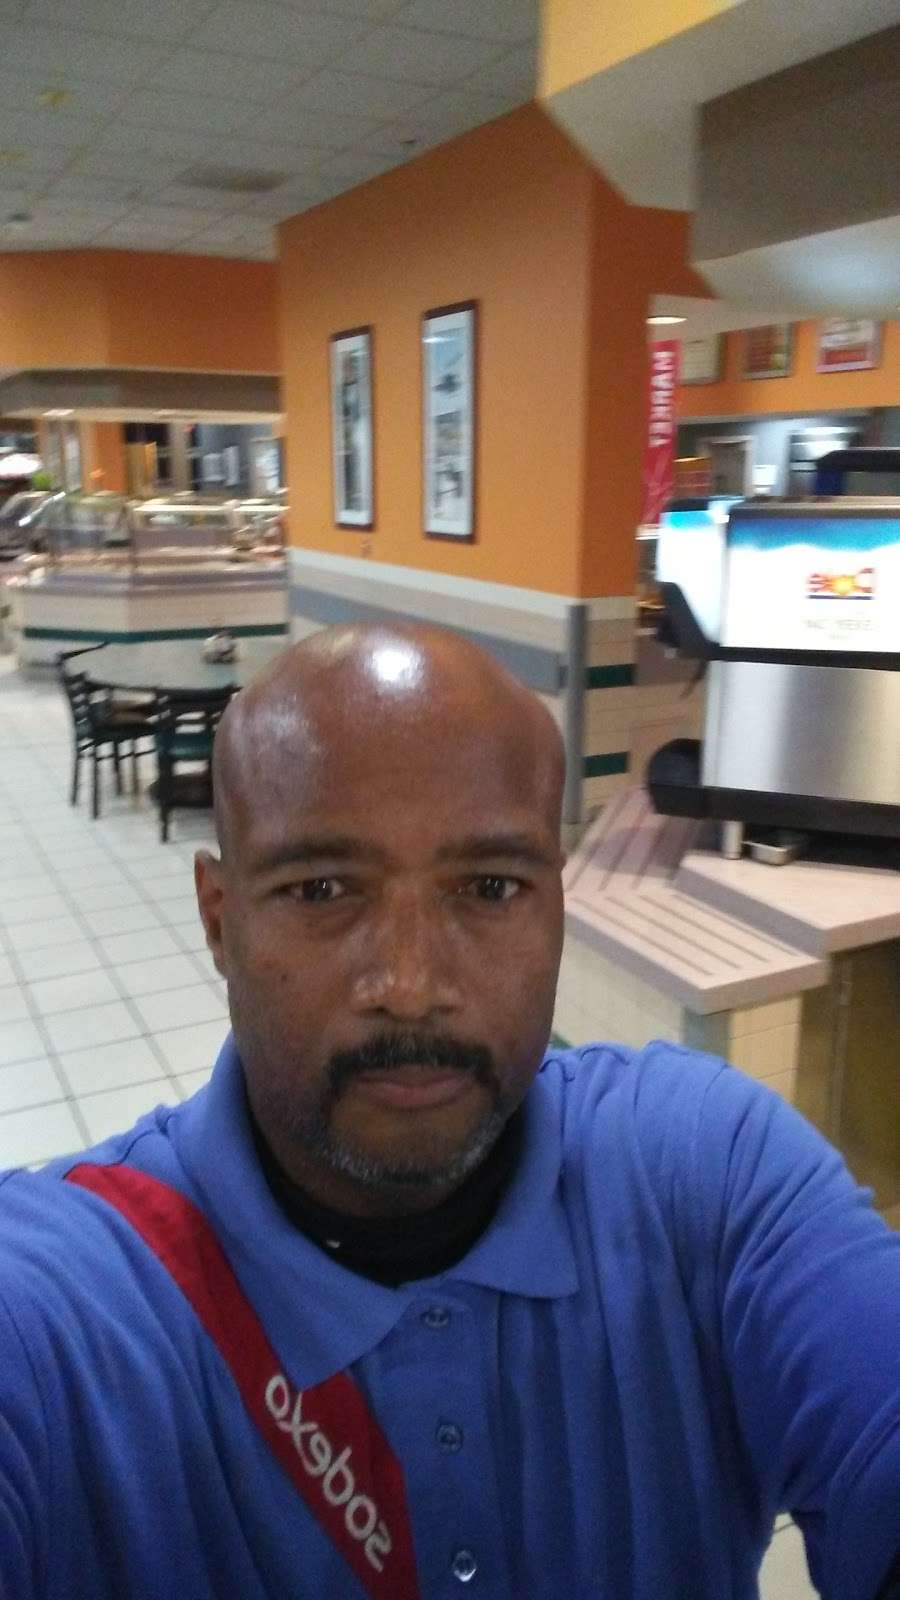 24 Area Messhall - restaurant  | Photo 3 of 8 | Address: Oceanside, CA 92058, USA